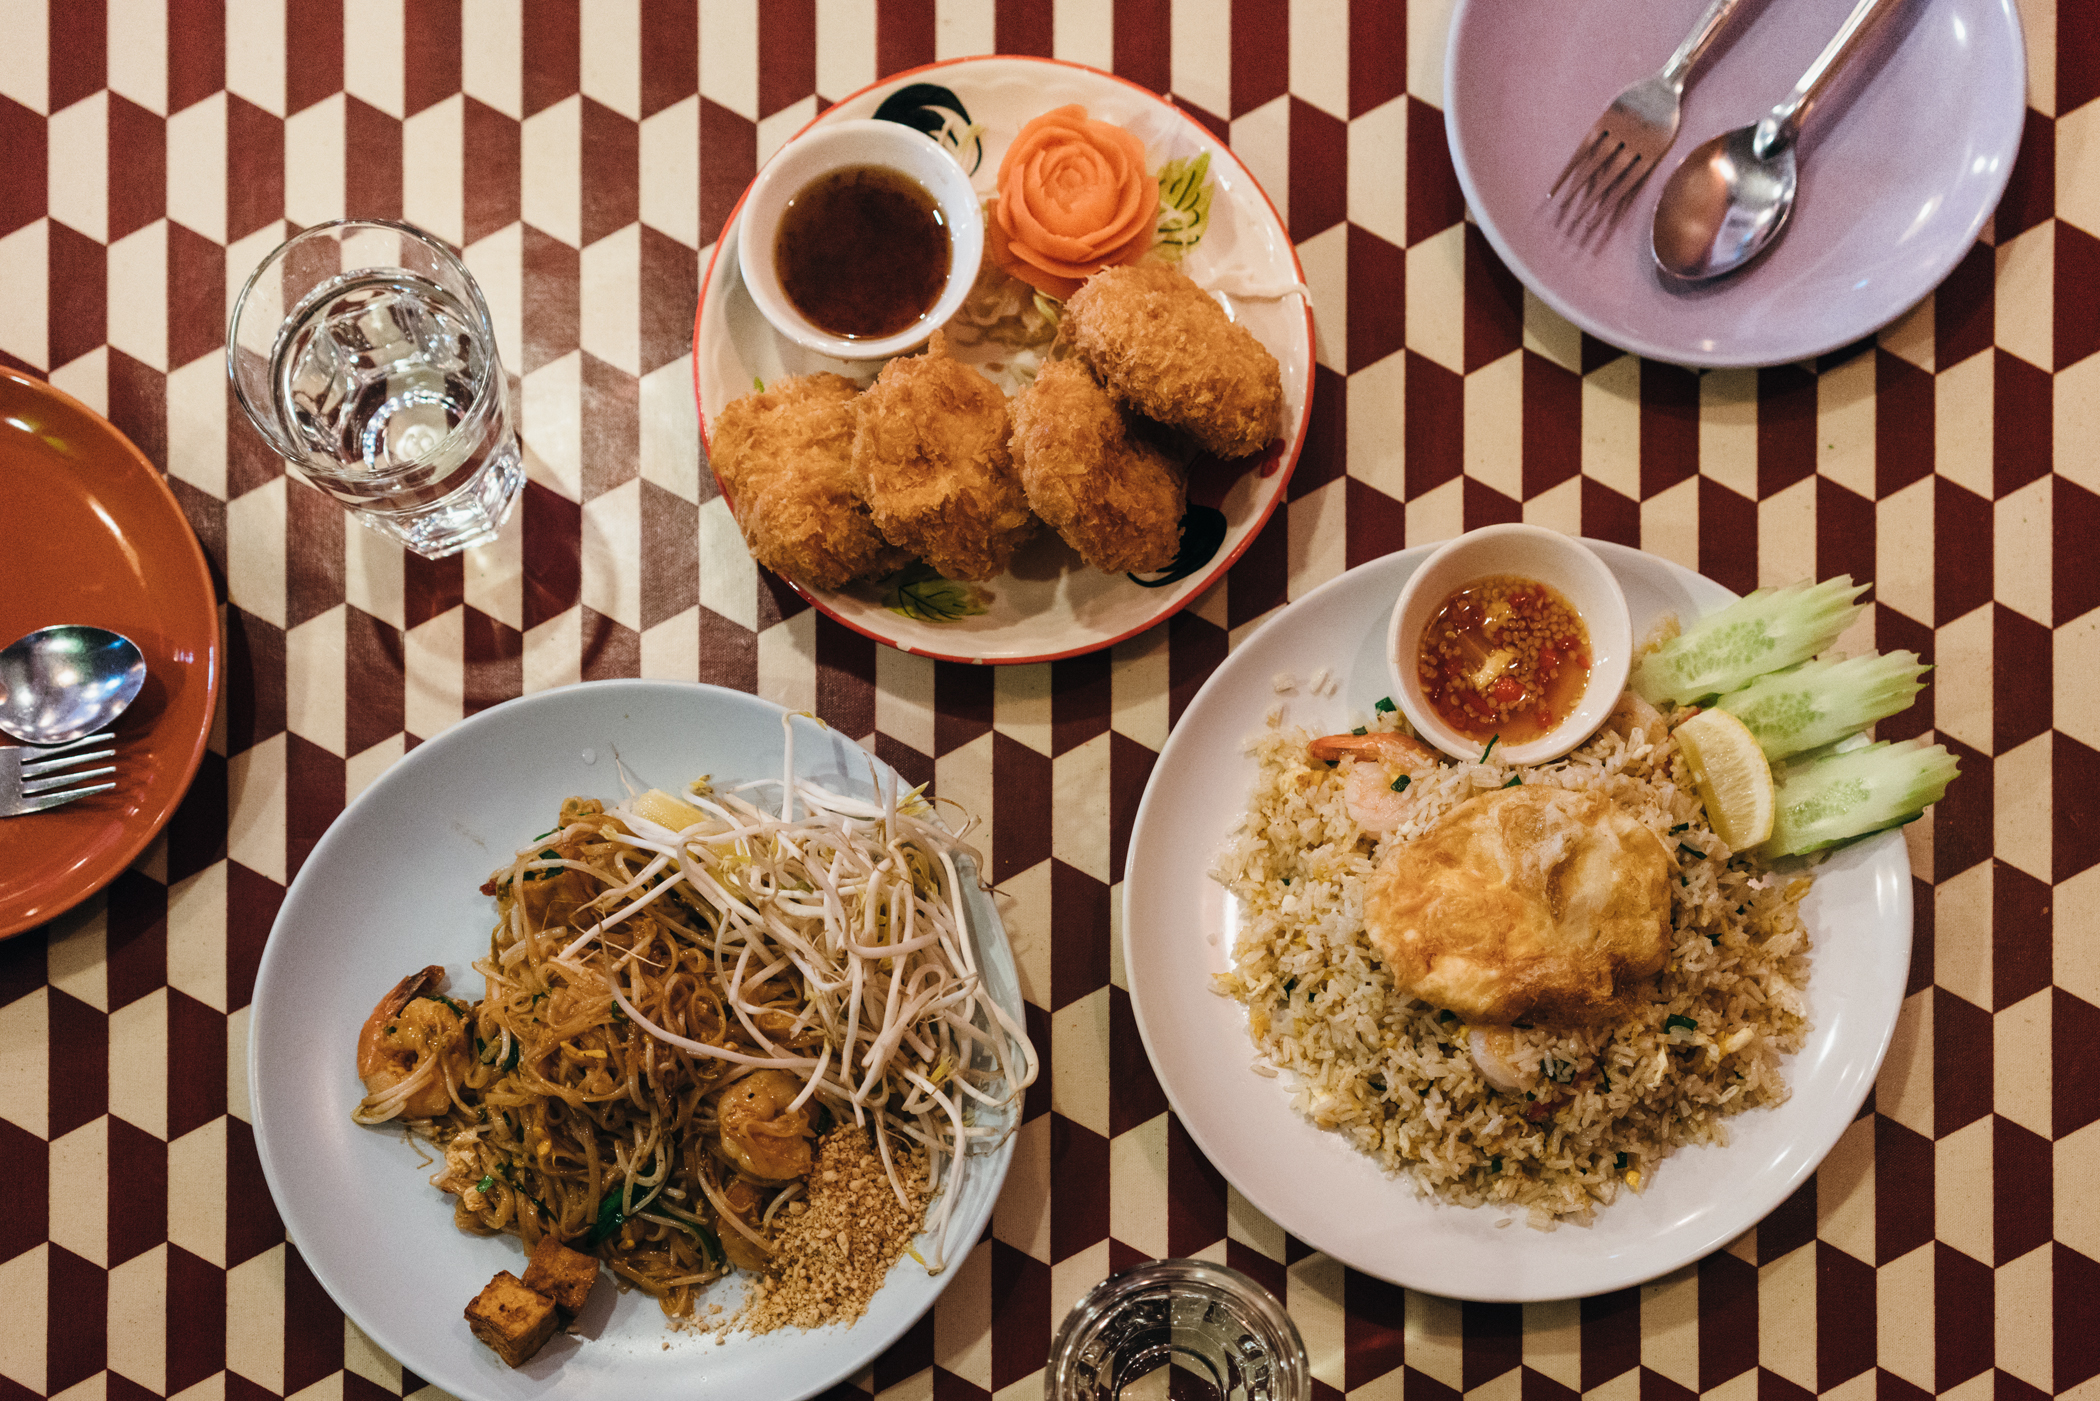 Greysuitcase Seoul Restaurant Series: Tuk Tuk Noodle Thai (툭툭누들타이), Yeonnam-dong (연남동), Seoul, South Korea.